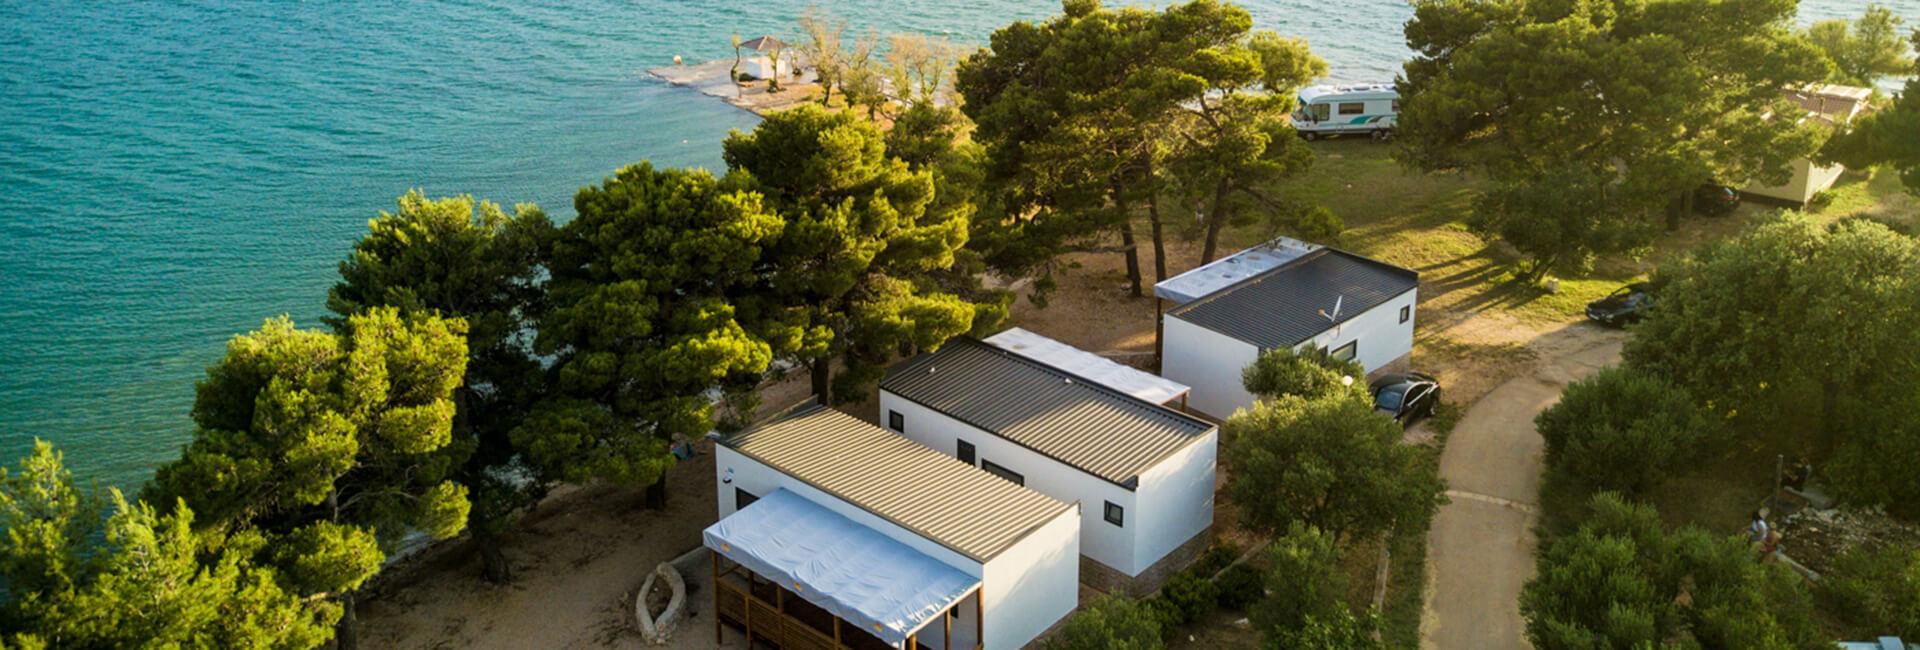 Camping Miran Pirovac